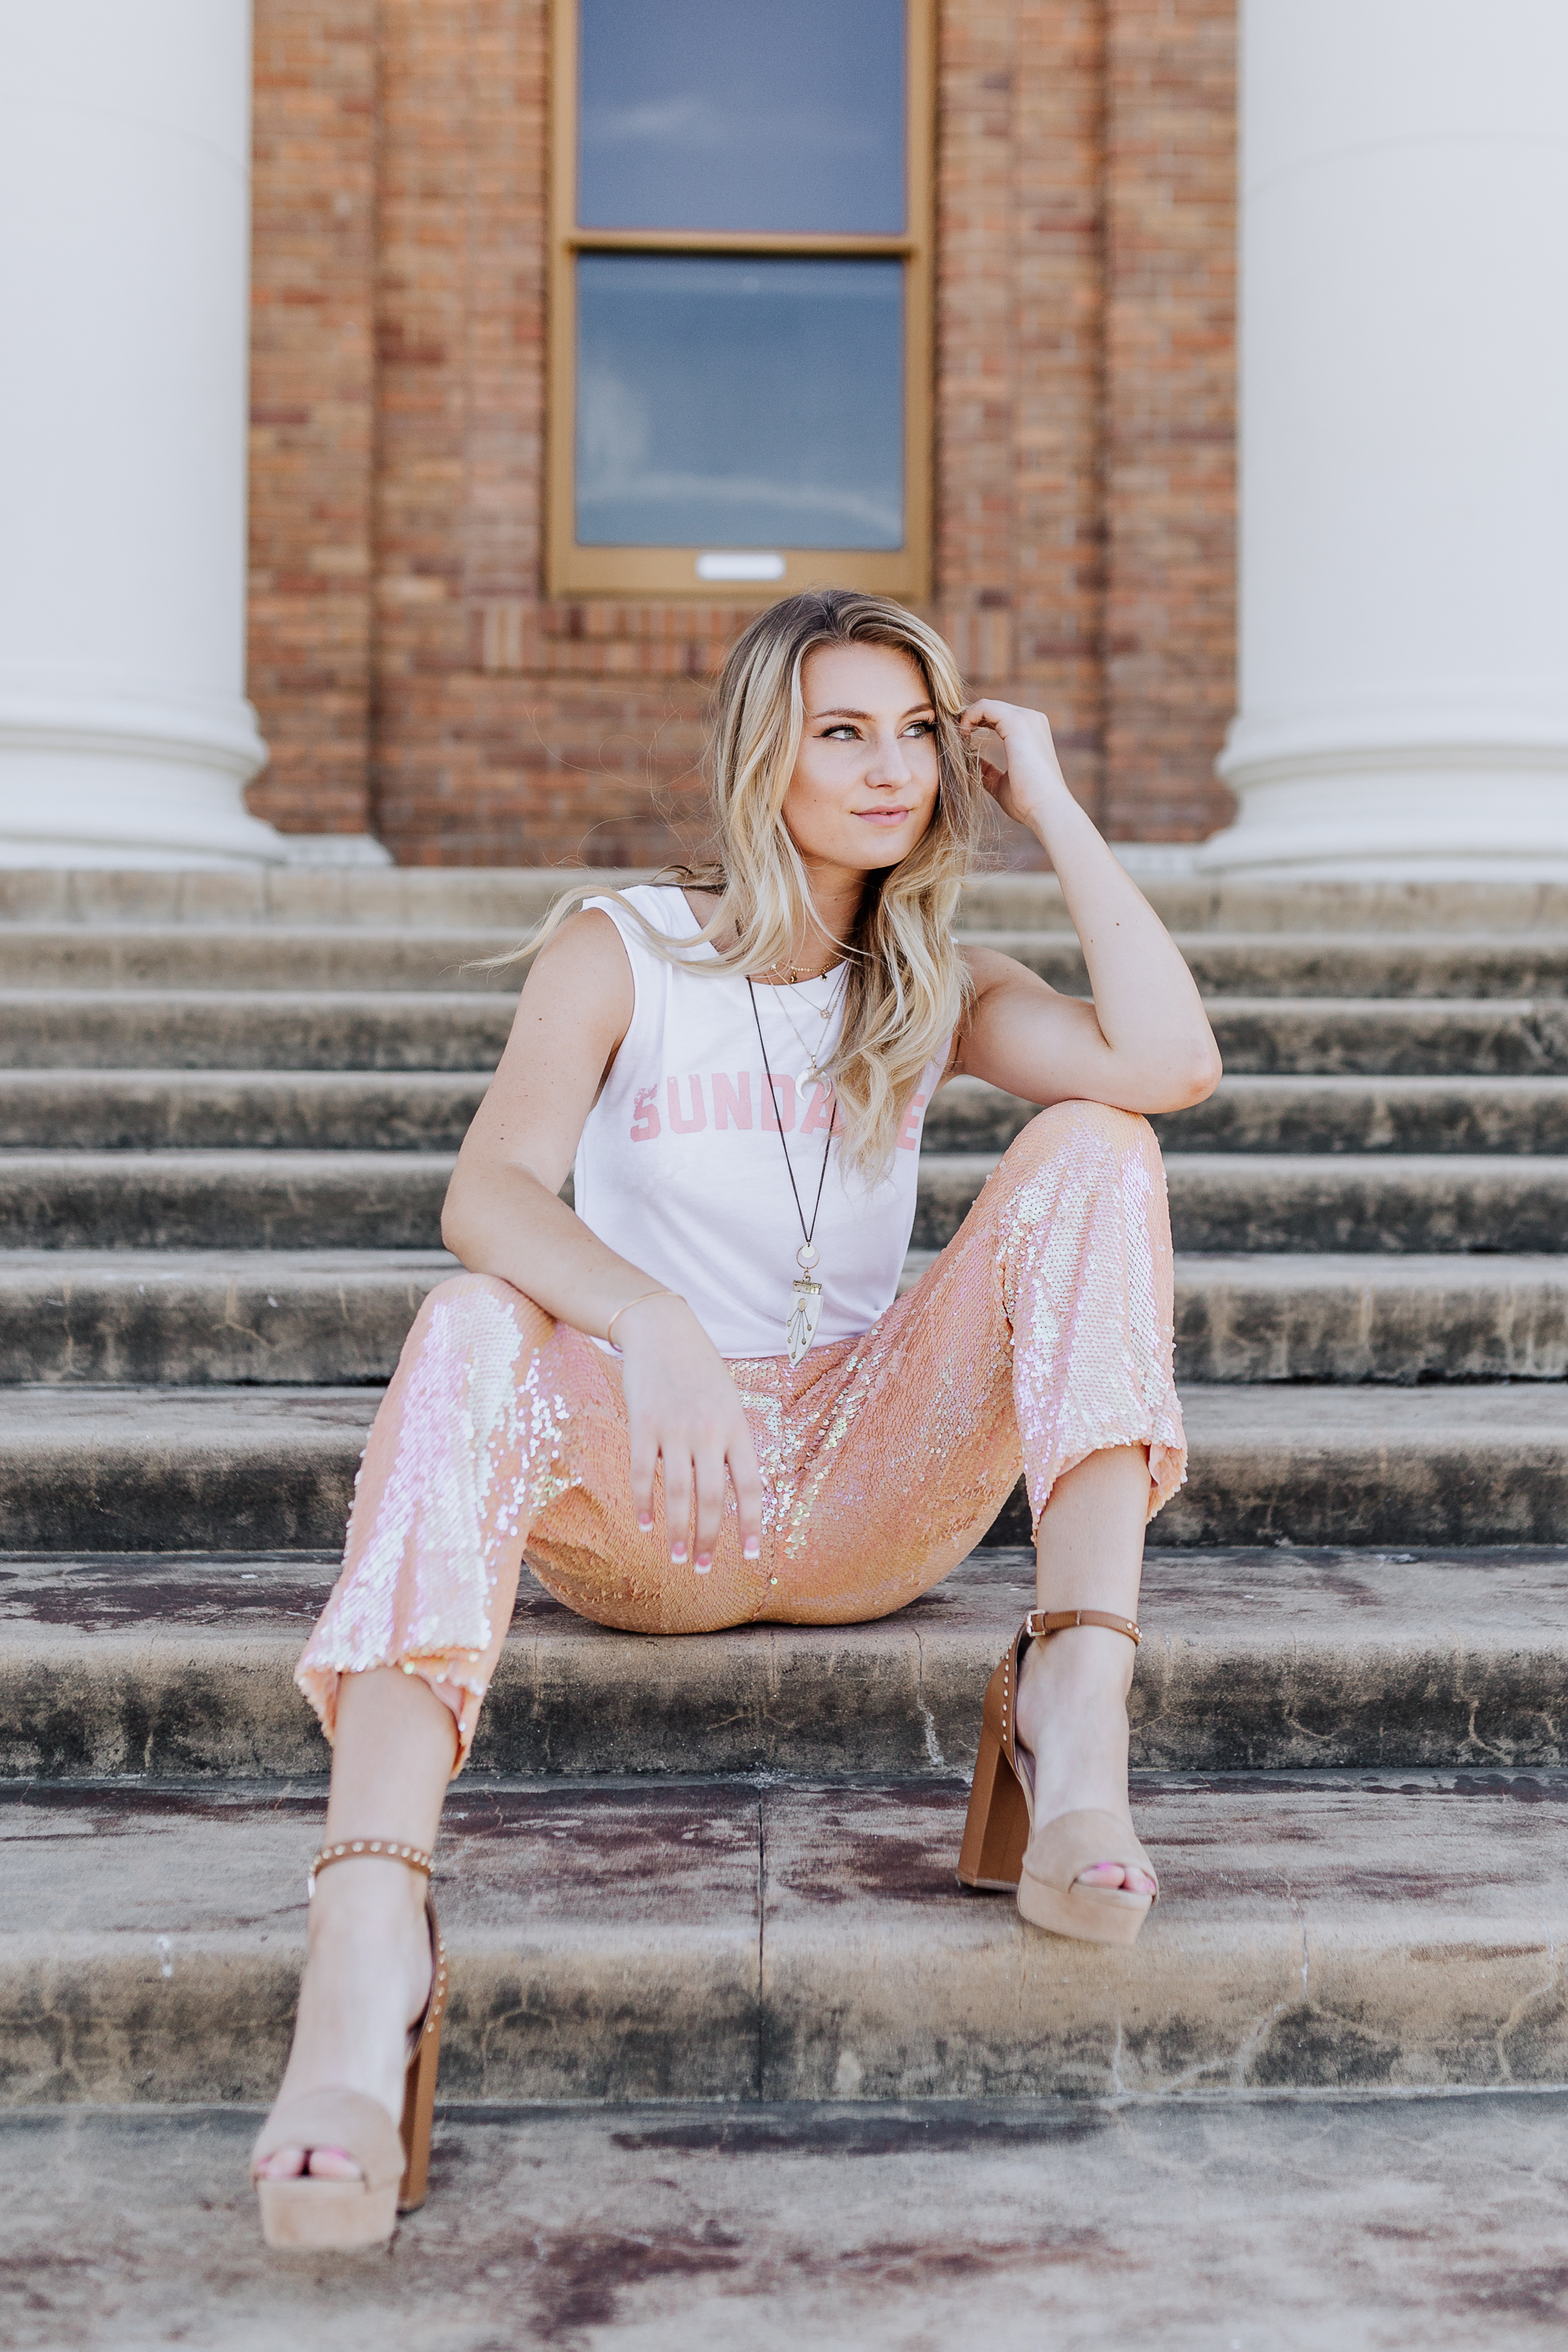 Heidi-Toevs-Editorial-Fashion-Photographer-San-Luis-Obispo-Califorinia